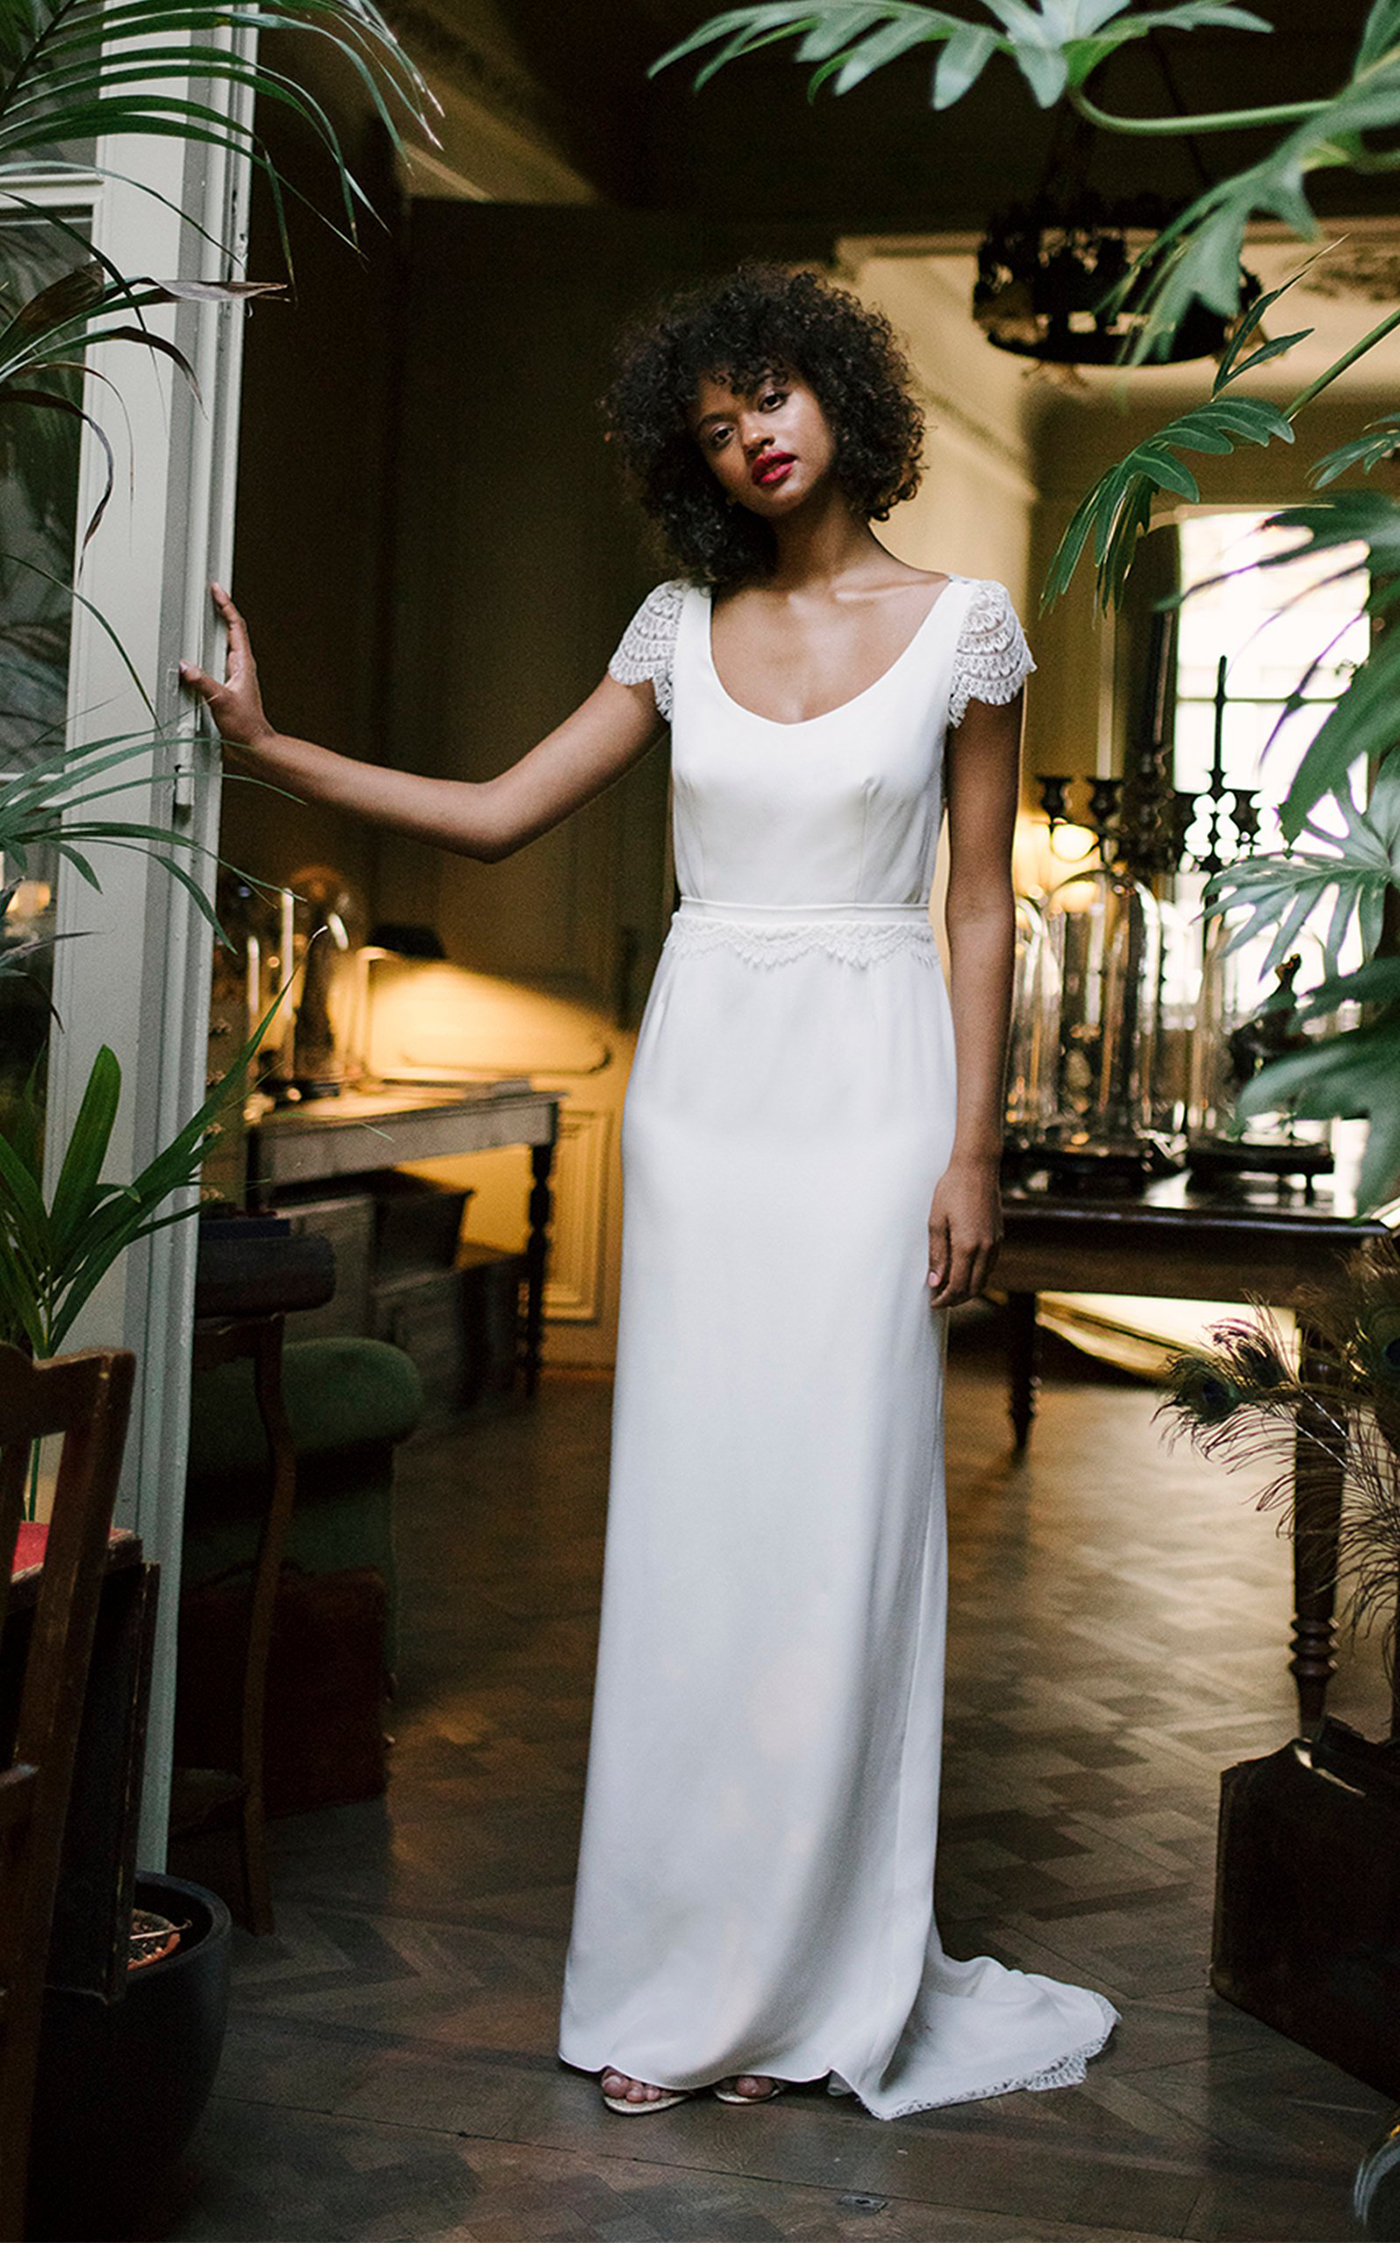 Daphne Bridgerton-Inspired Wedding Dress